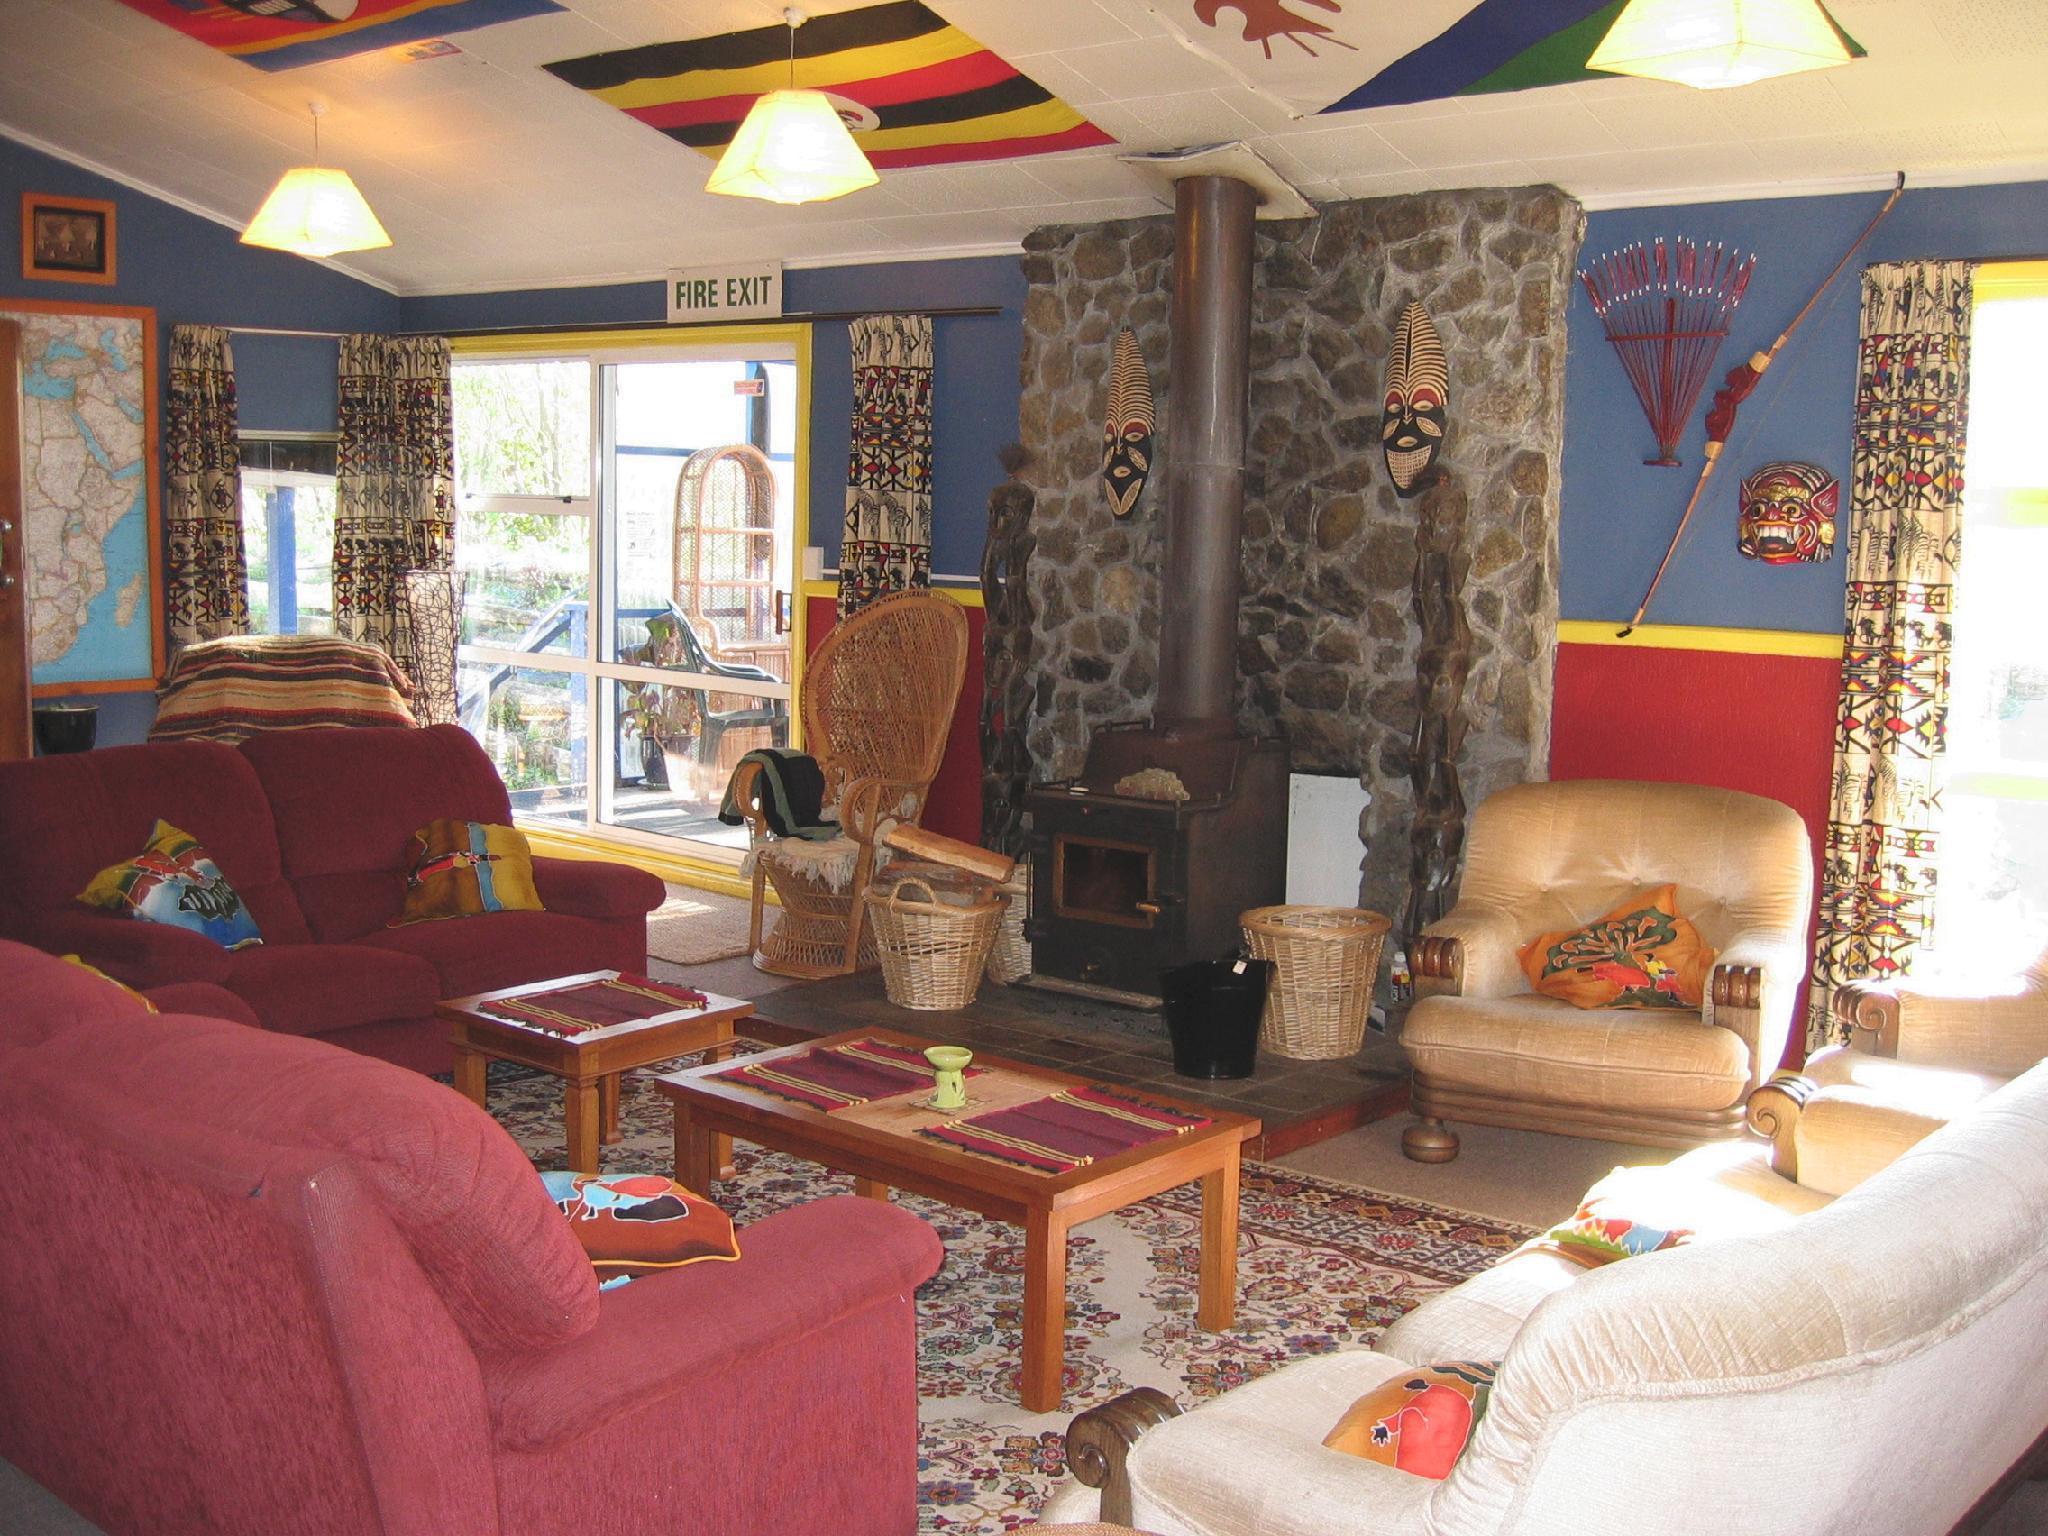 Global Village Travellers Lodge, Grey